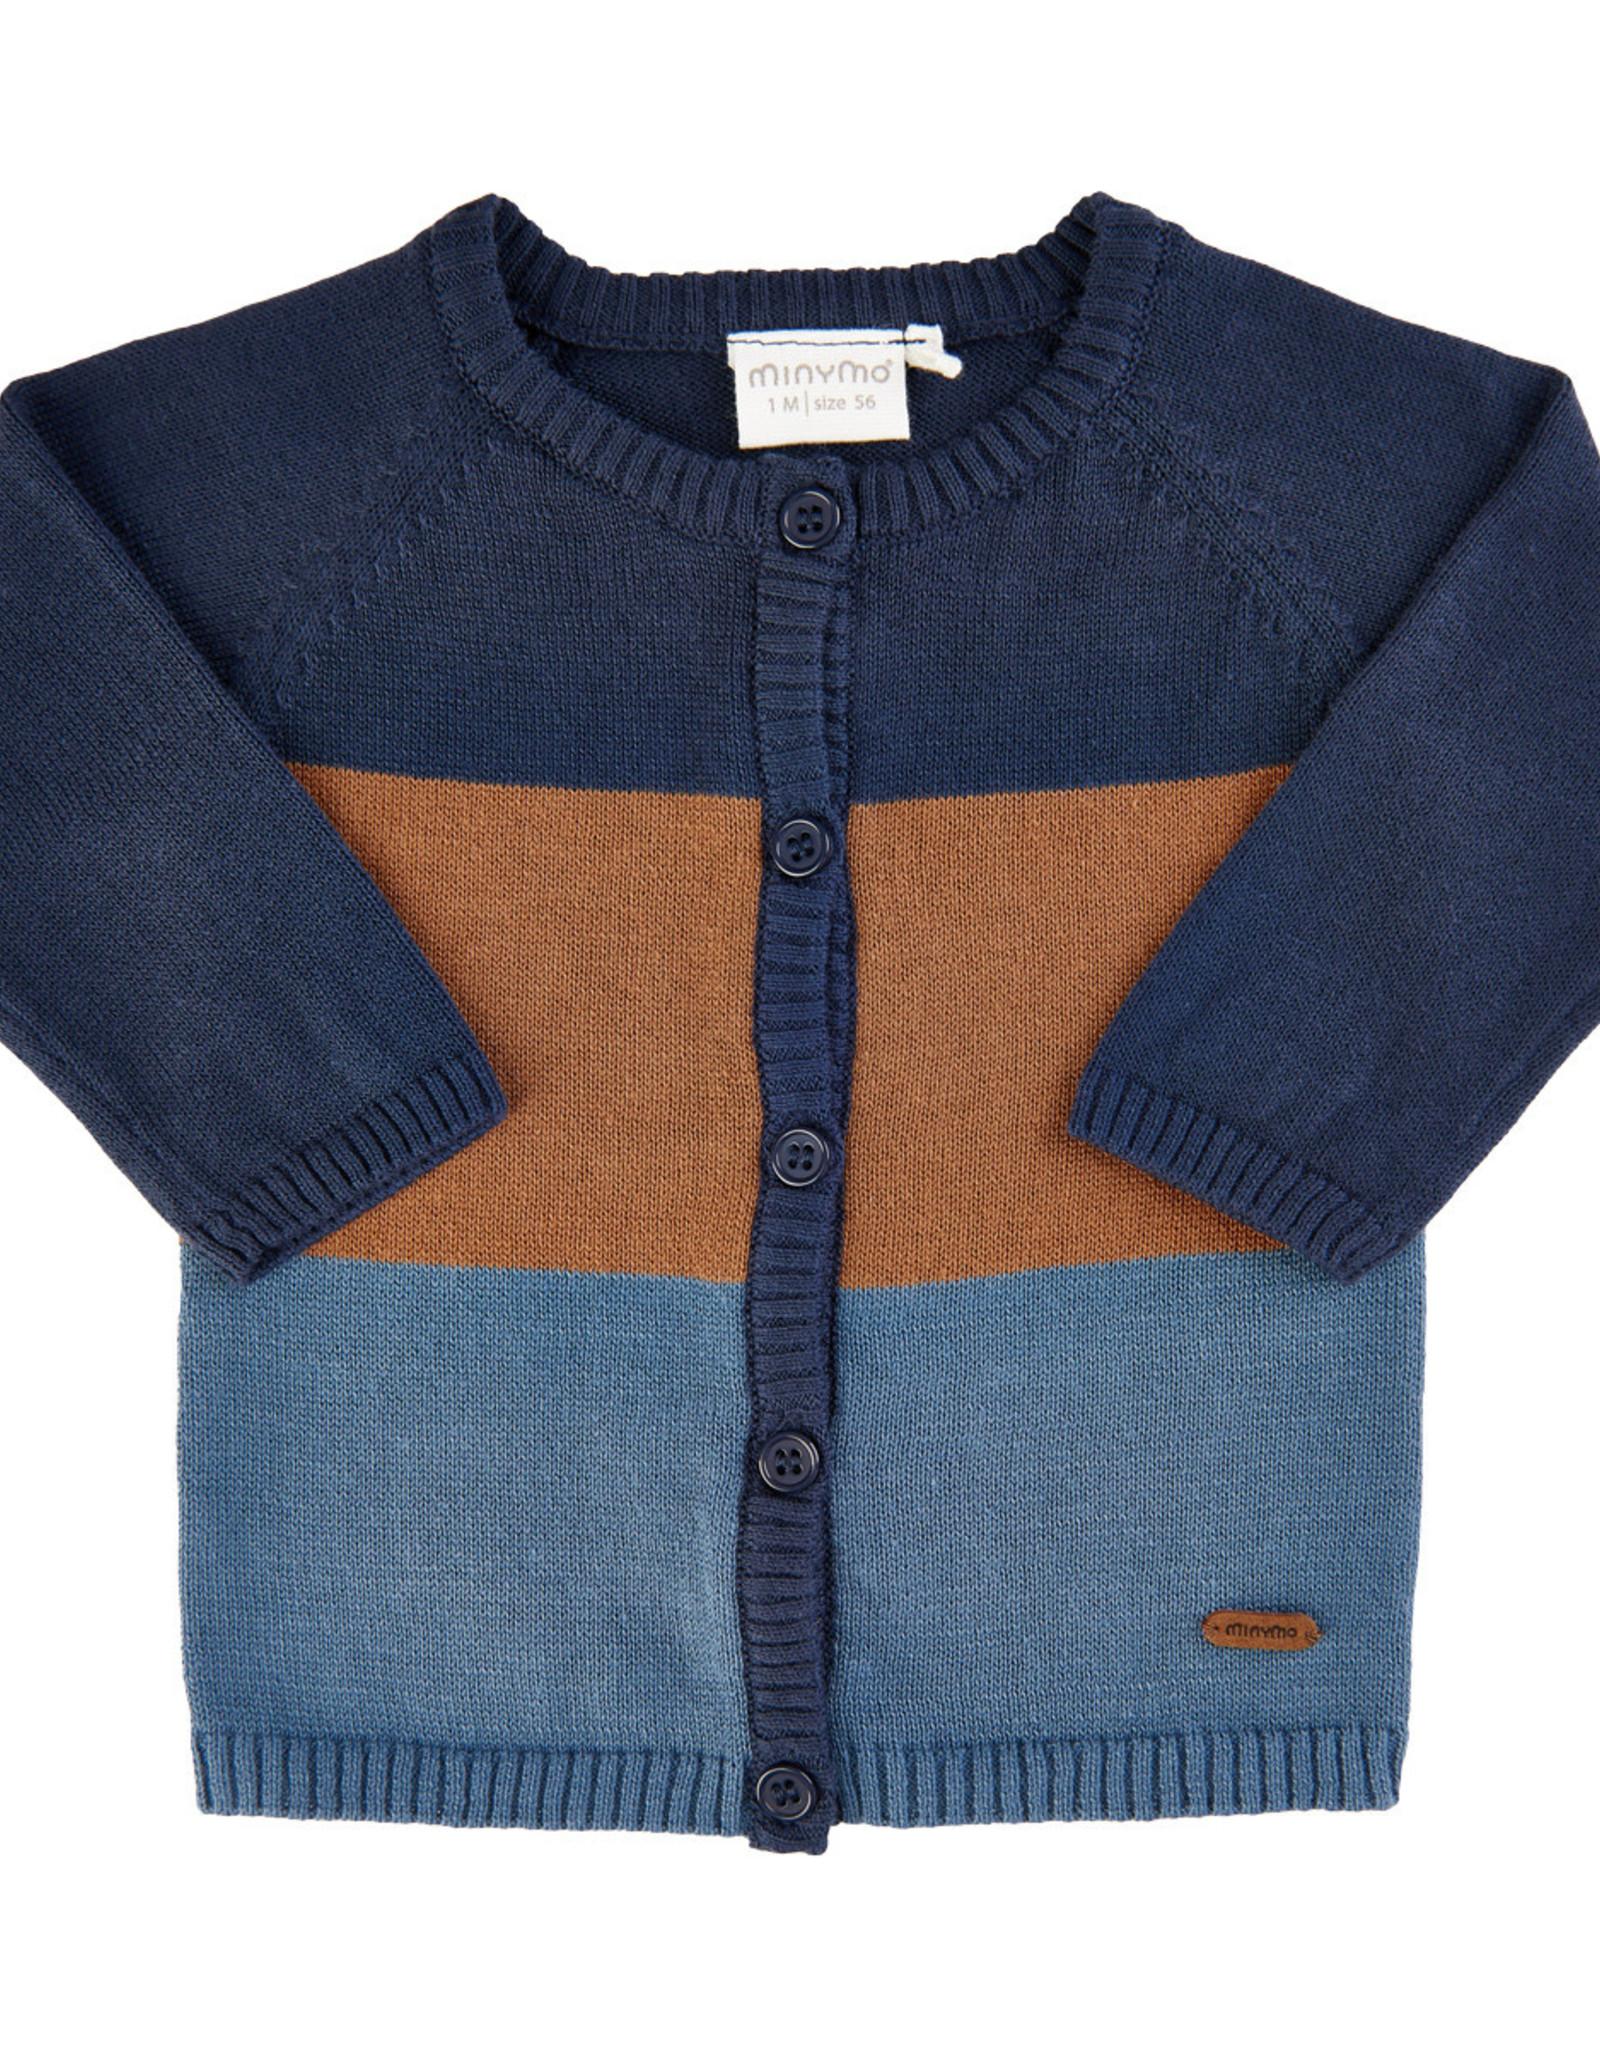 MinyMo FA20 Baby Indigo Knit Cardigan